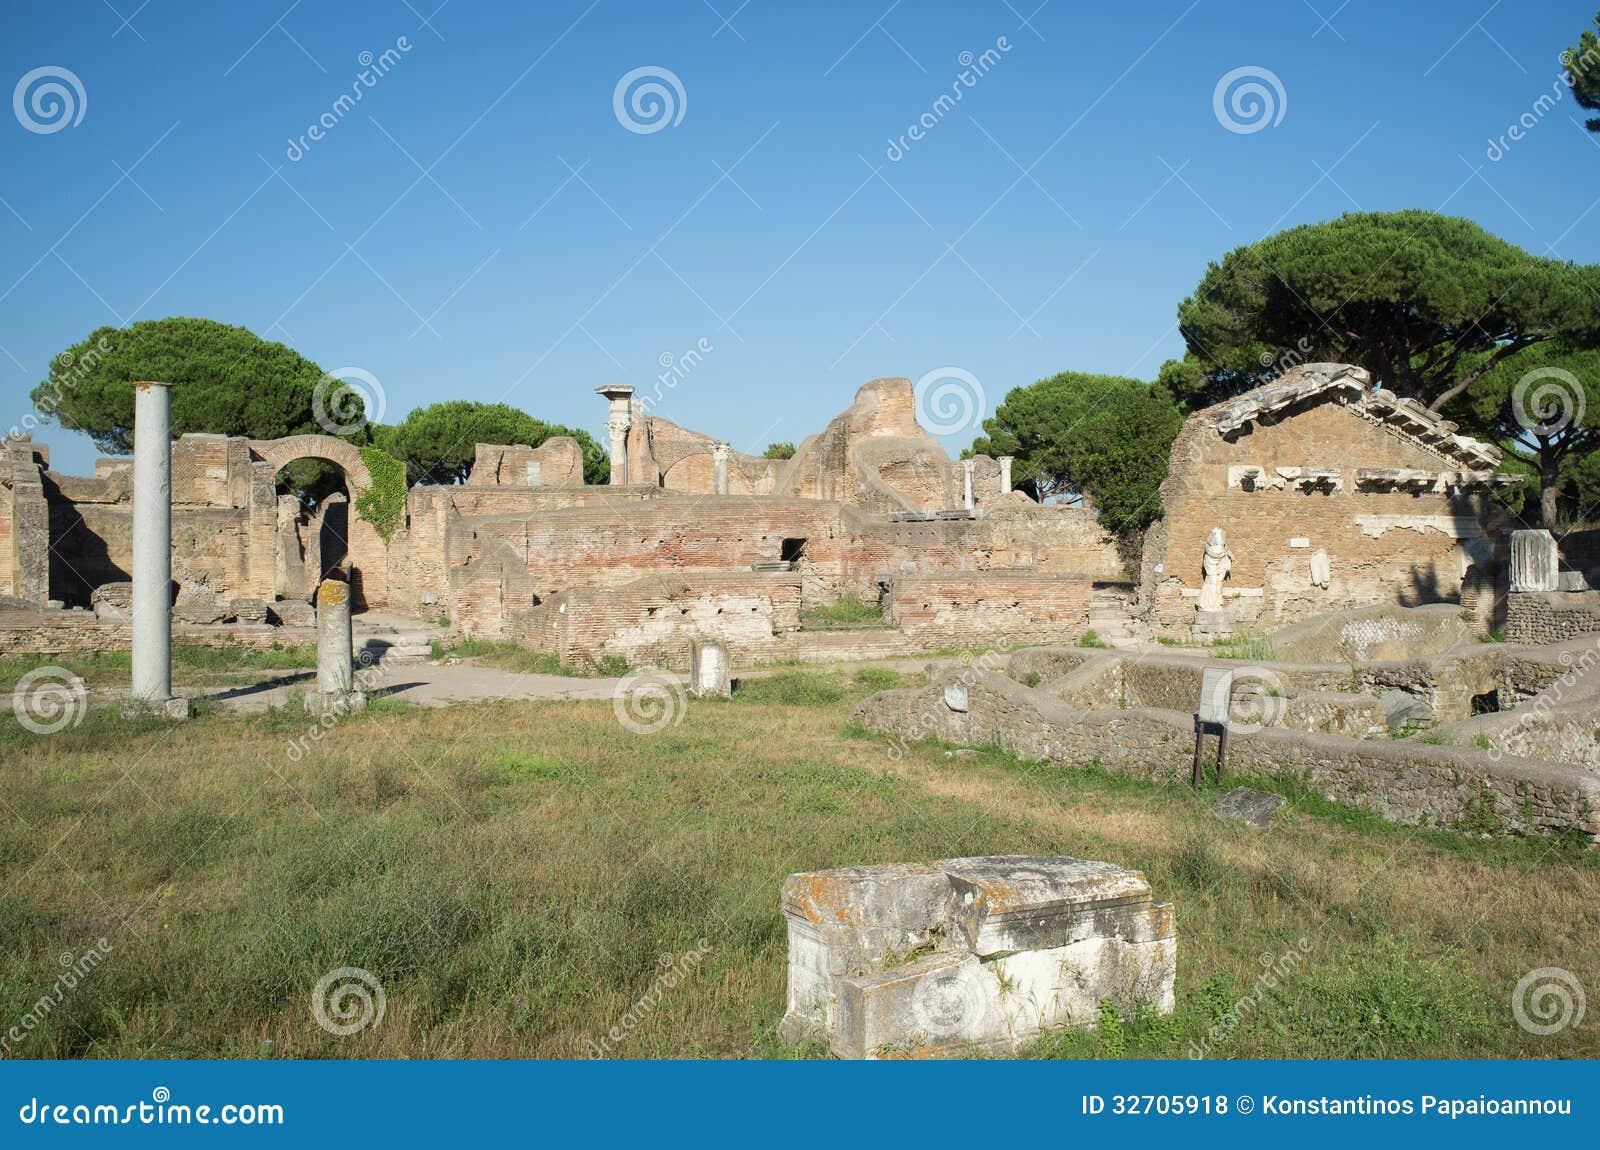 Ostia antica in rome royalty free stock photos image for Mr arredamenti ostia antica